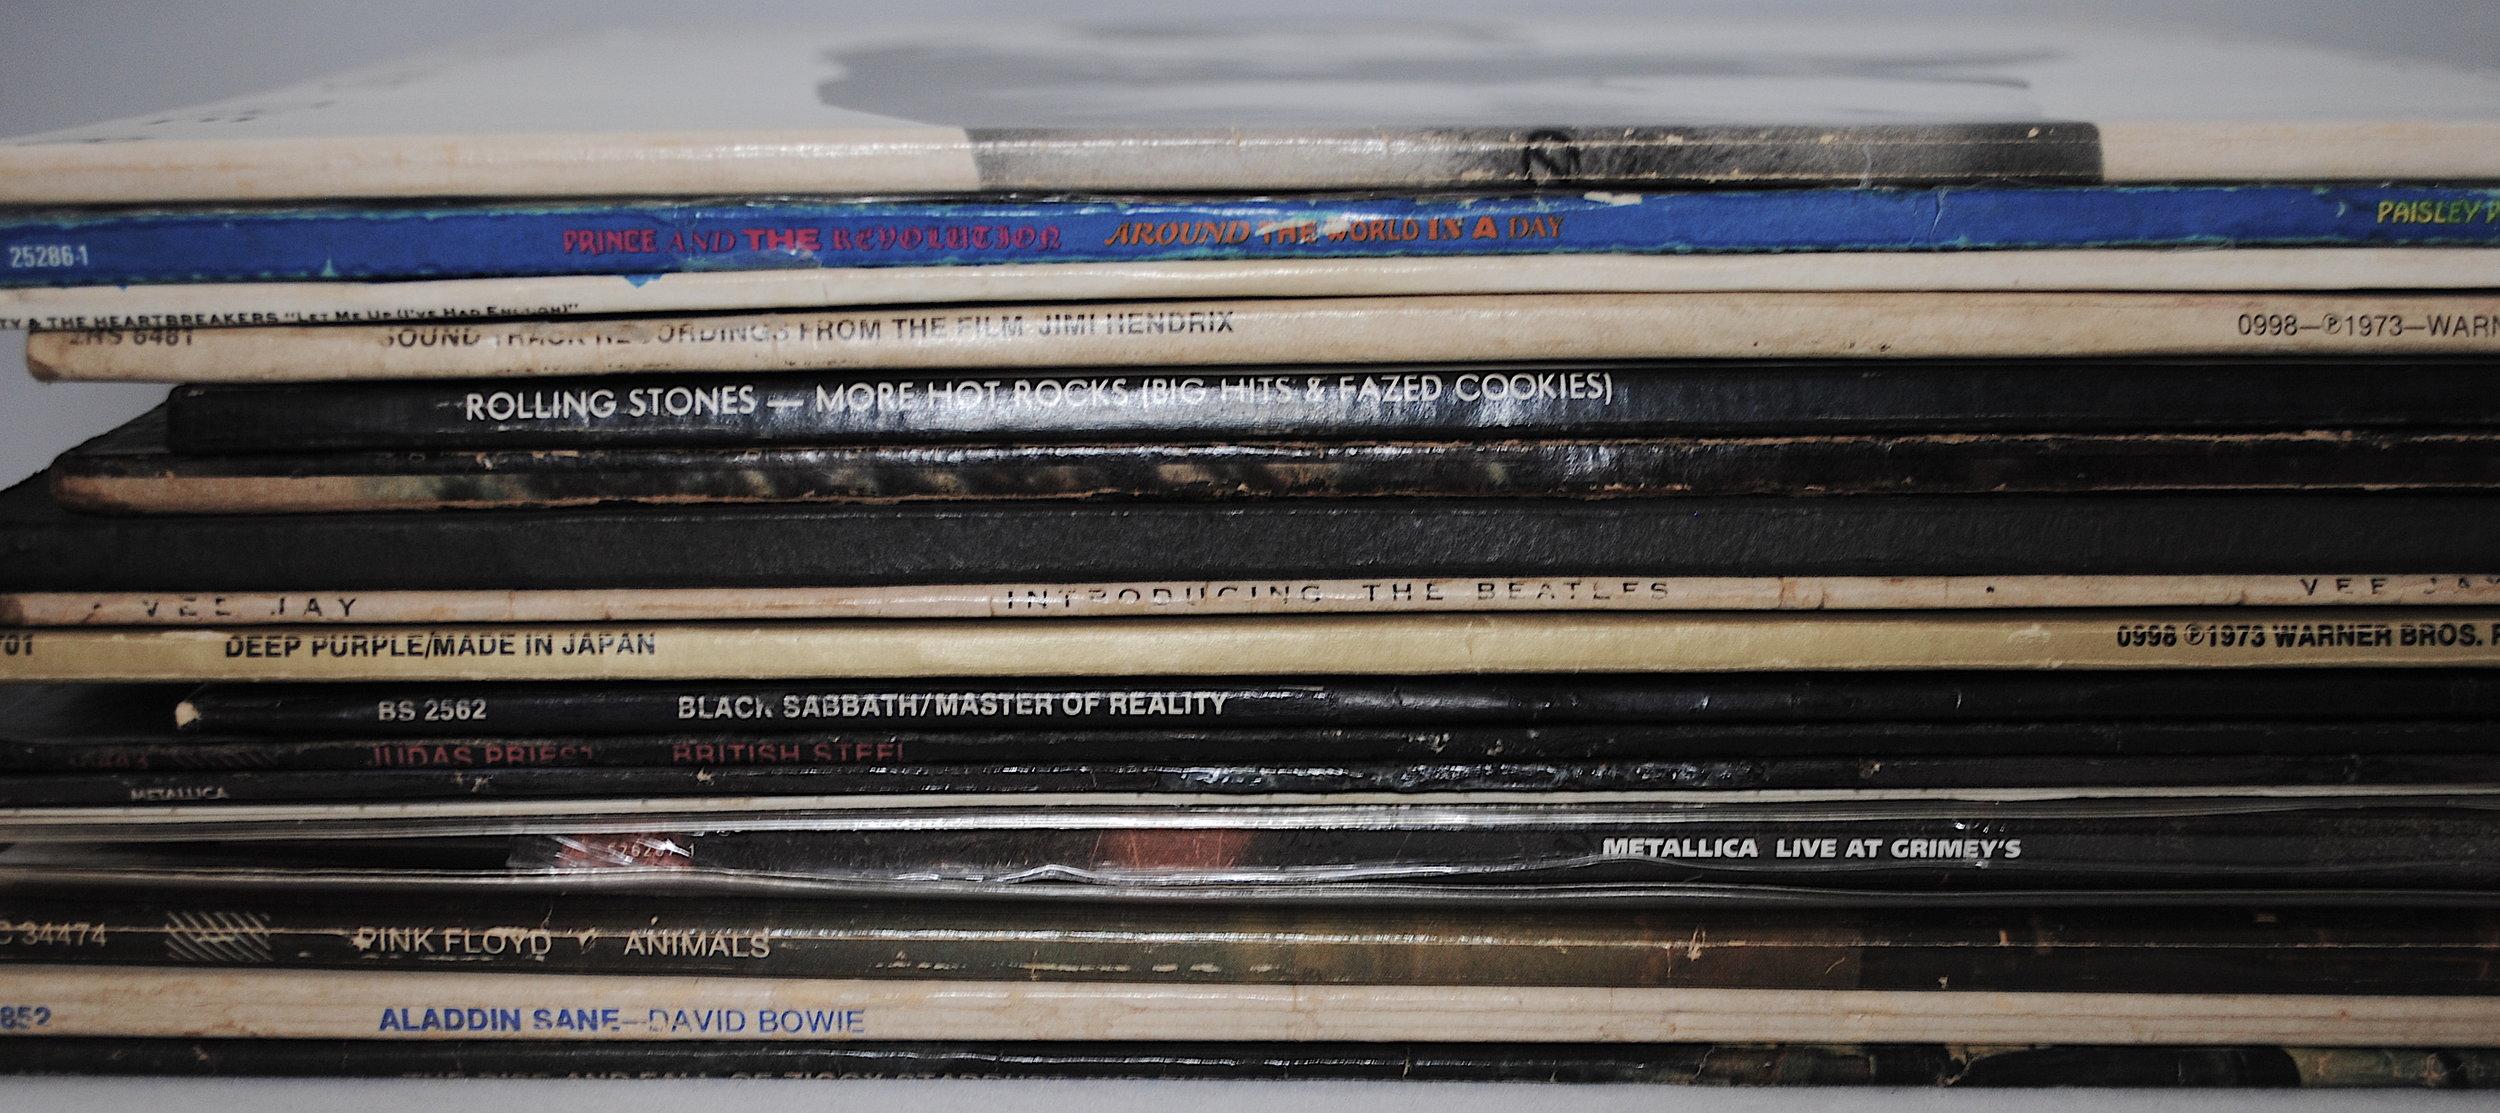 vinylrecords.JPG